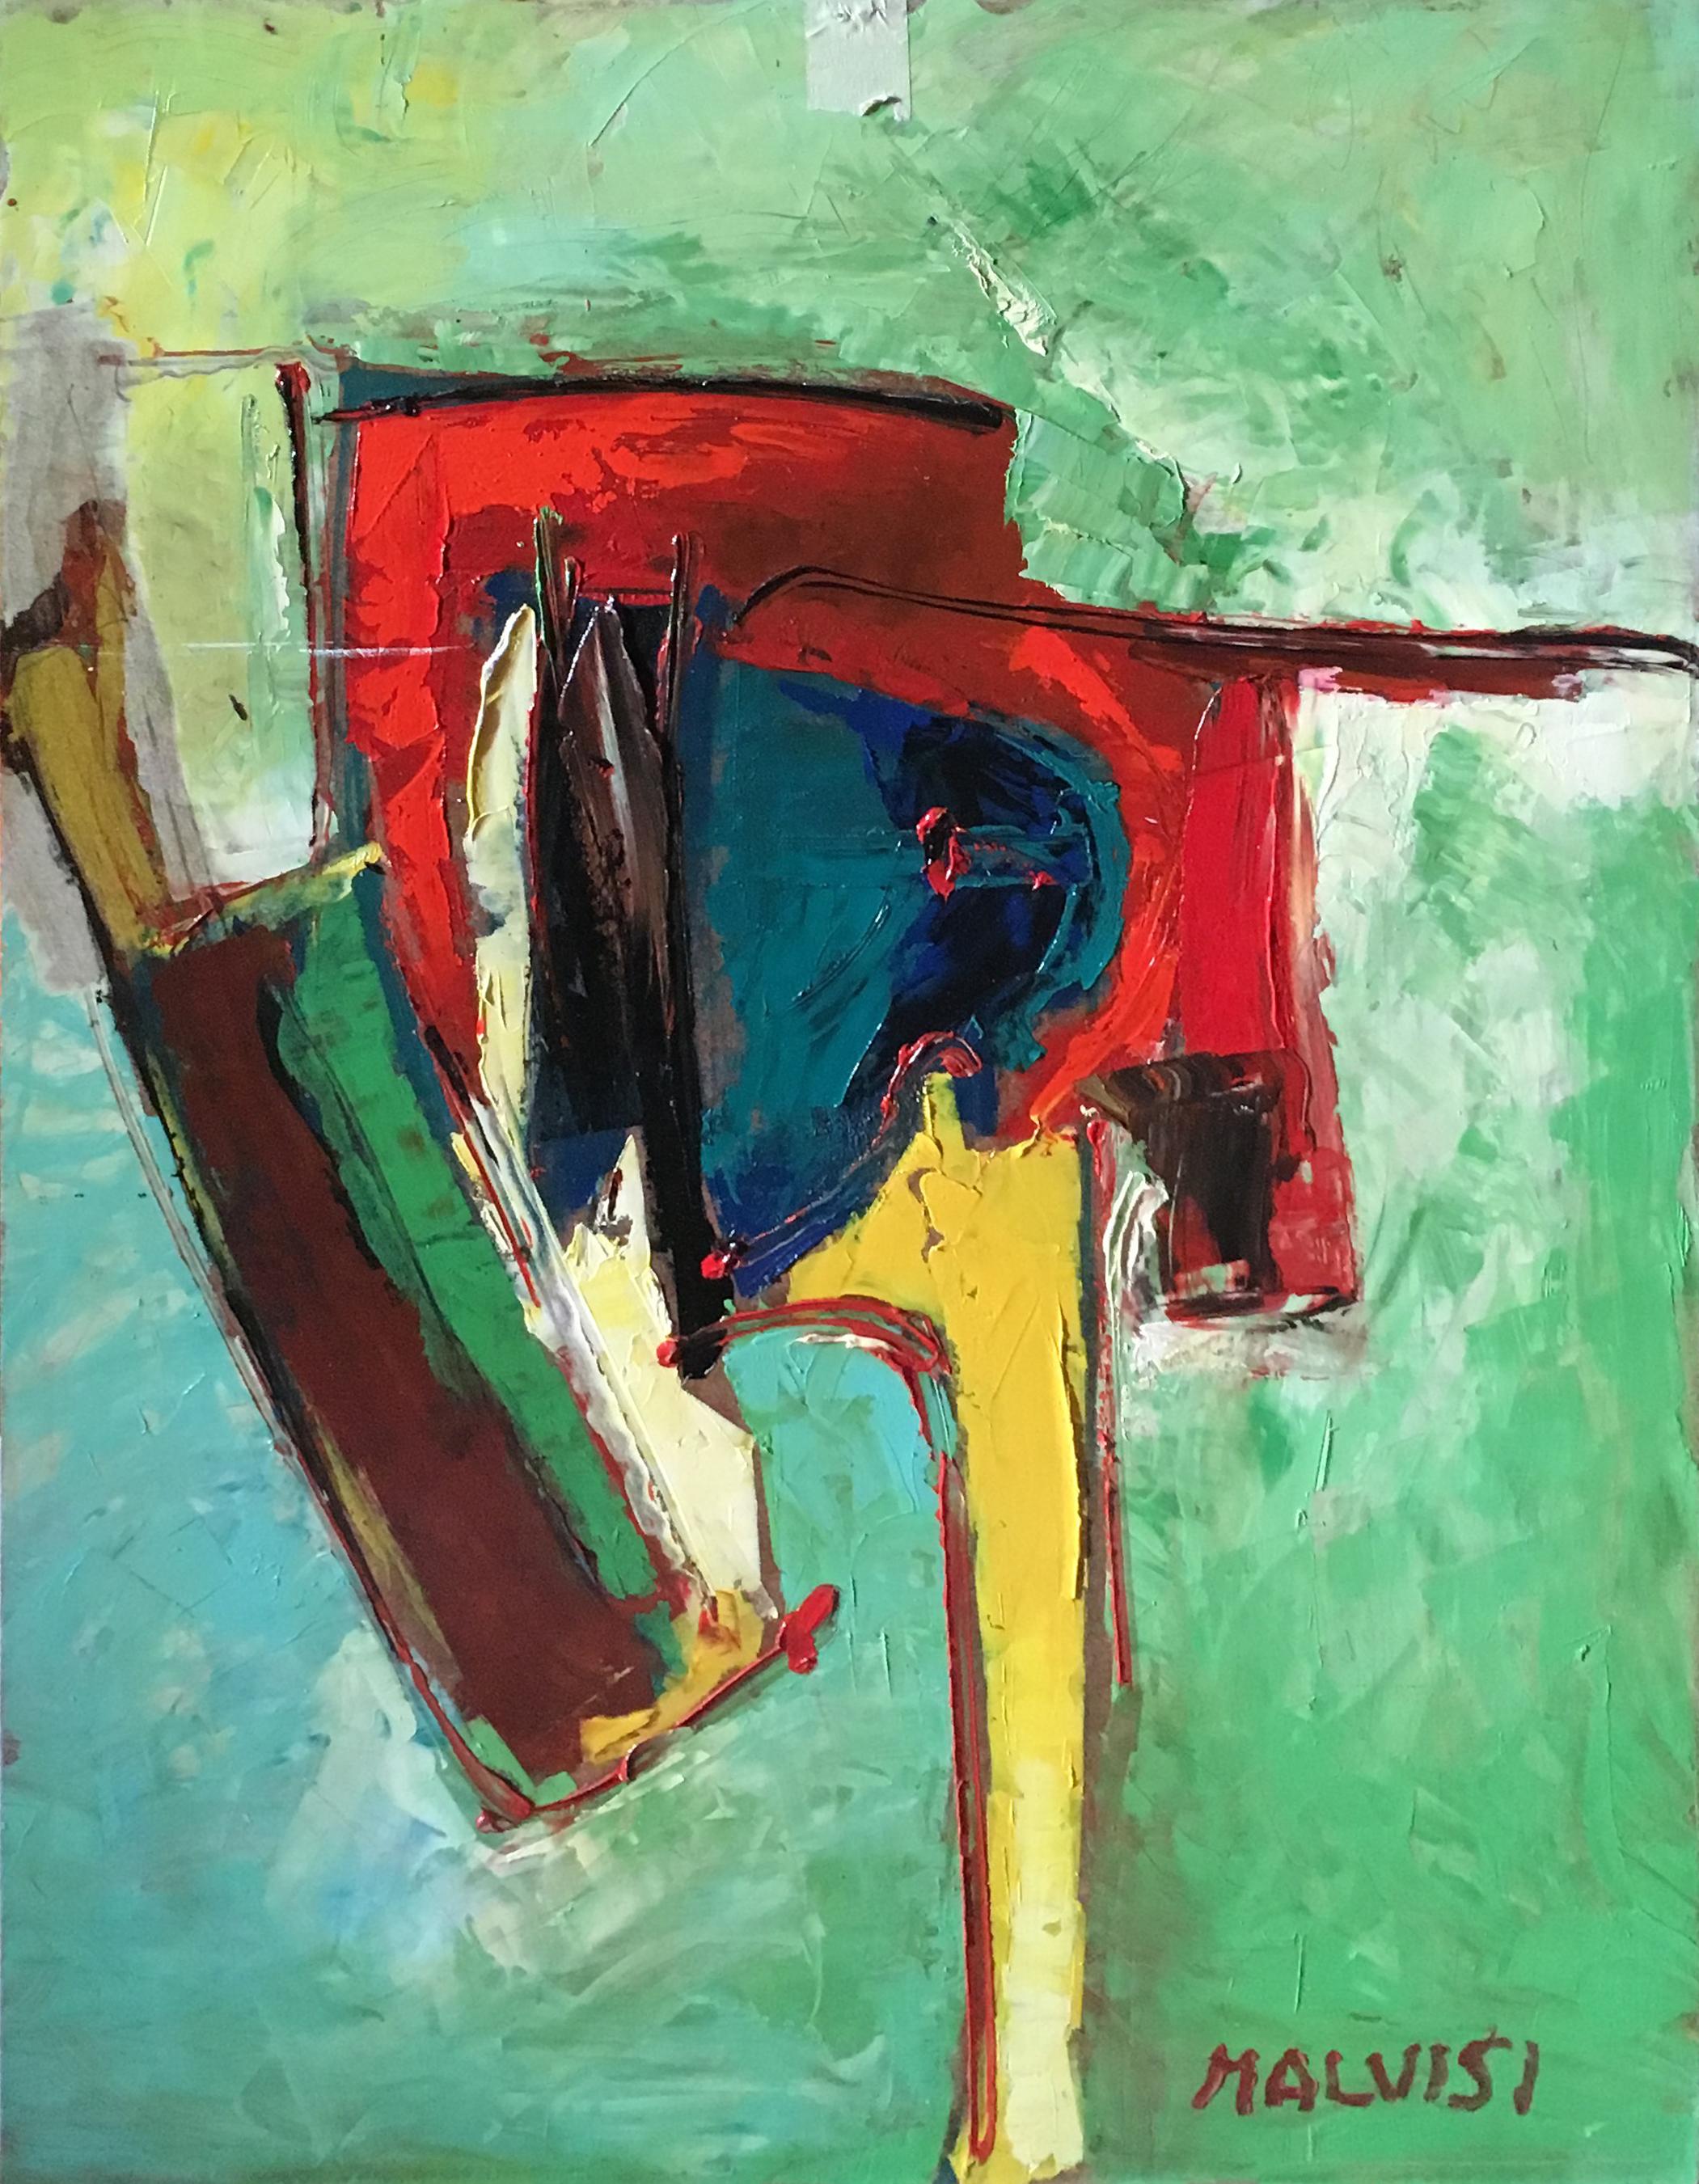 <b>Intimate essence</b><br>(Orig.Essenza intima) <br> 2007 Oil on wood <br> cm 50 x 70